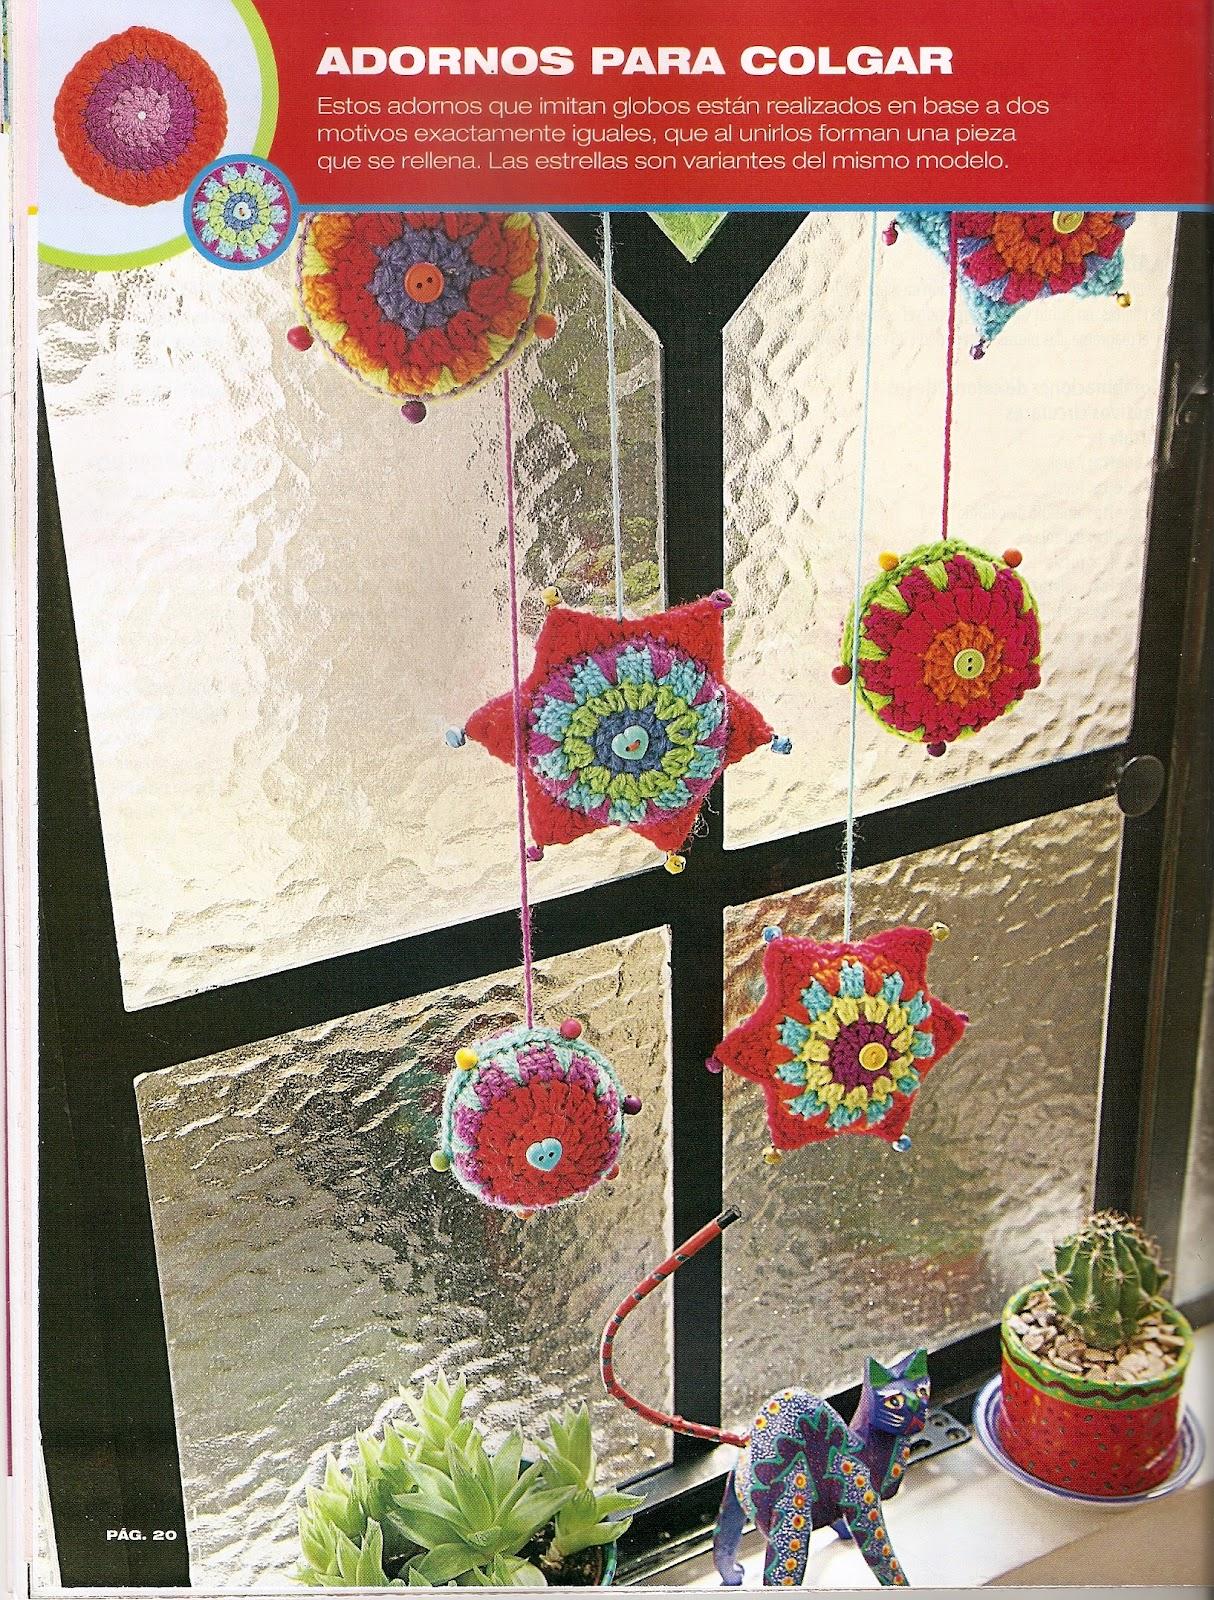 Tejidos artesanales adornos para colgar for Adornos colgar pared